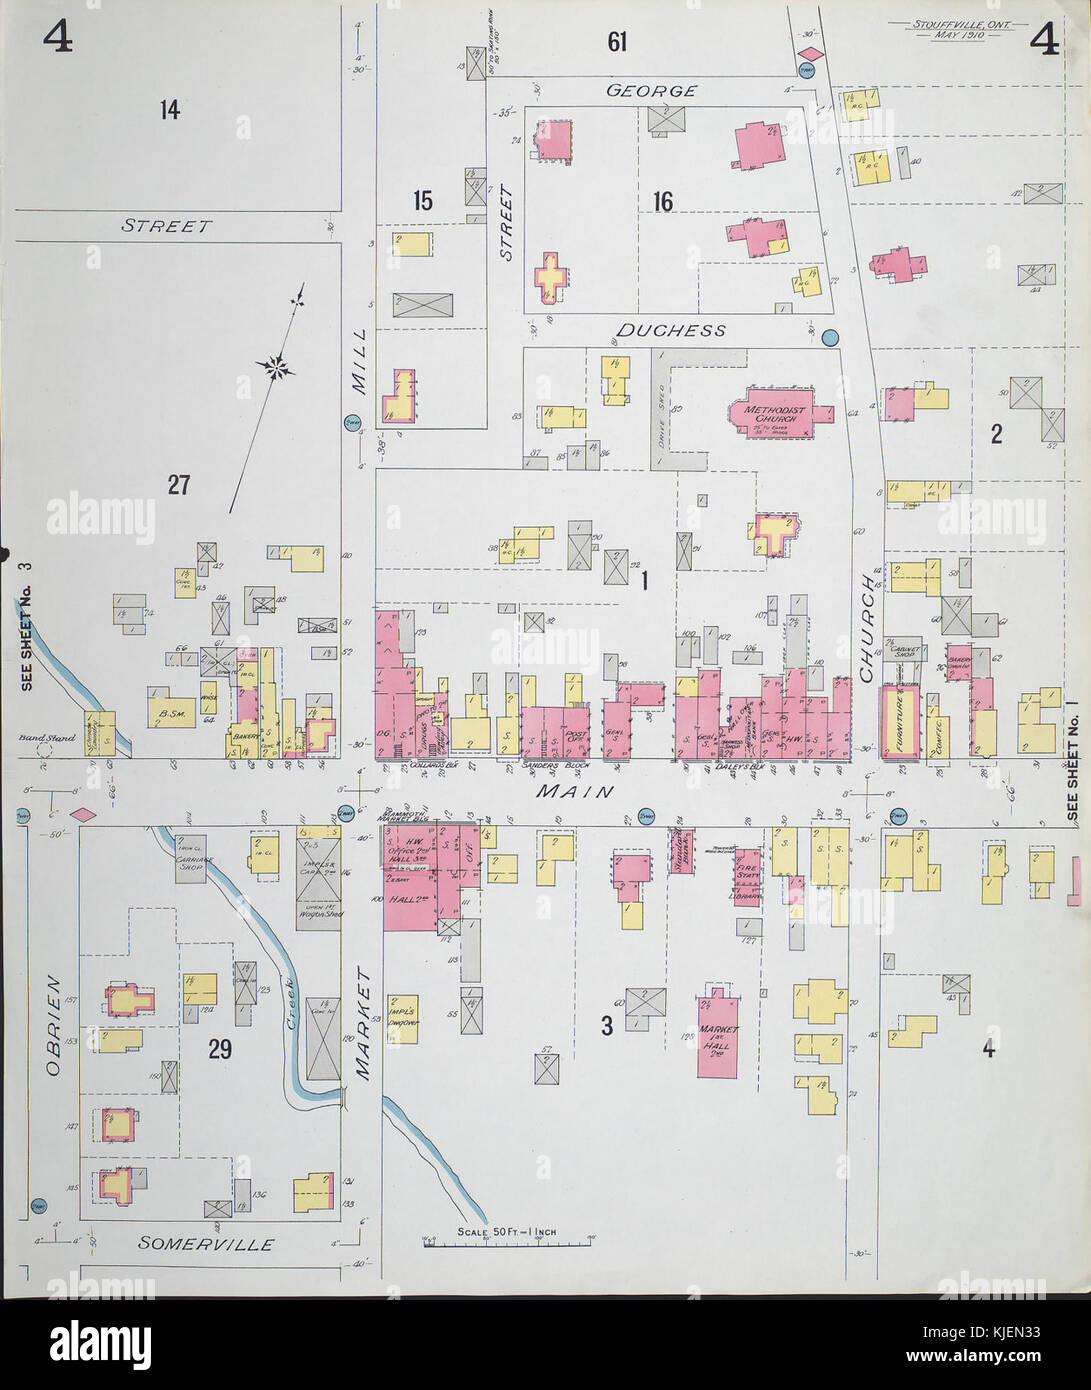 Fire Insurance Map Stouffville Ontario Sheet 4 1910 Stock Photo